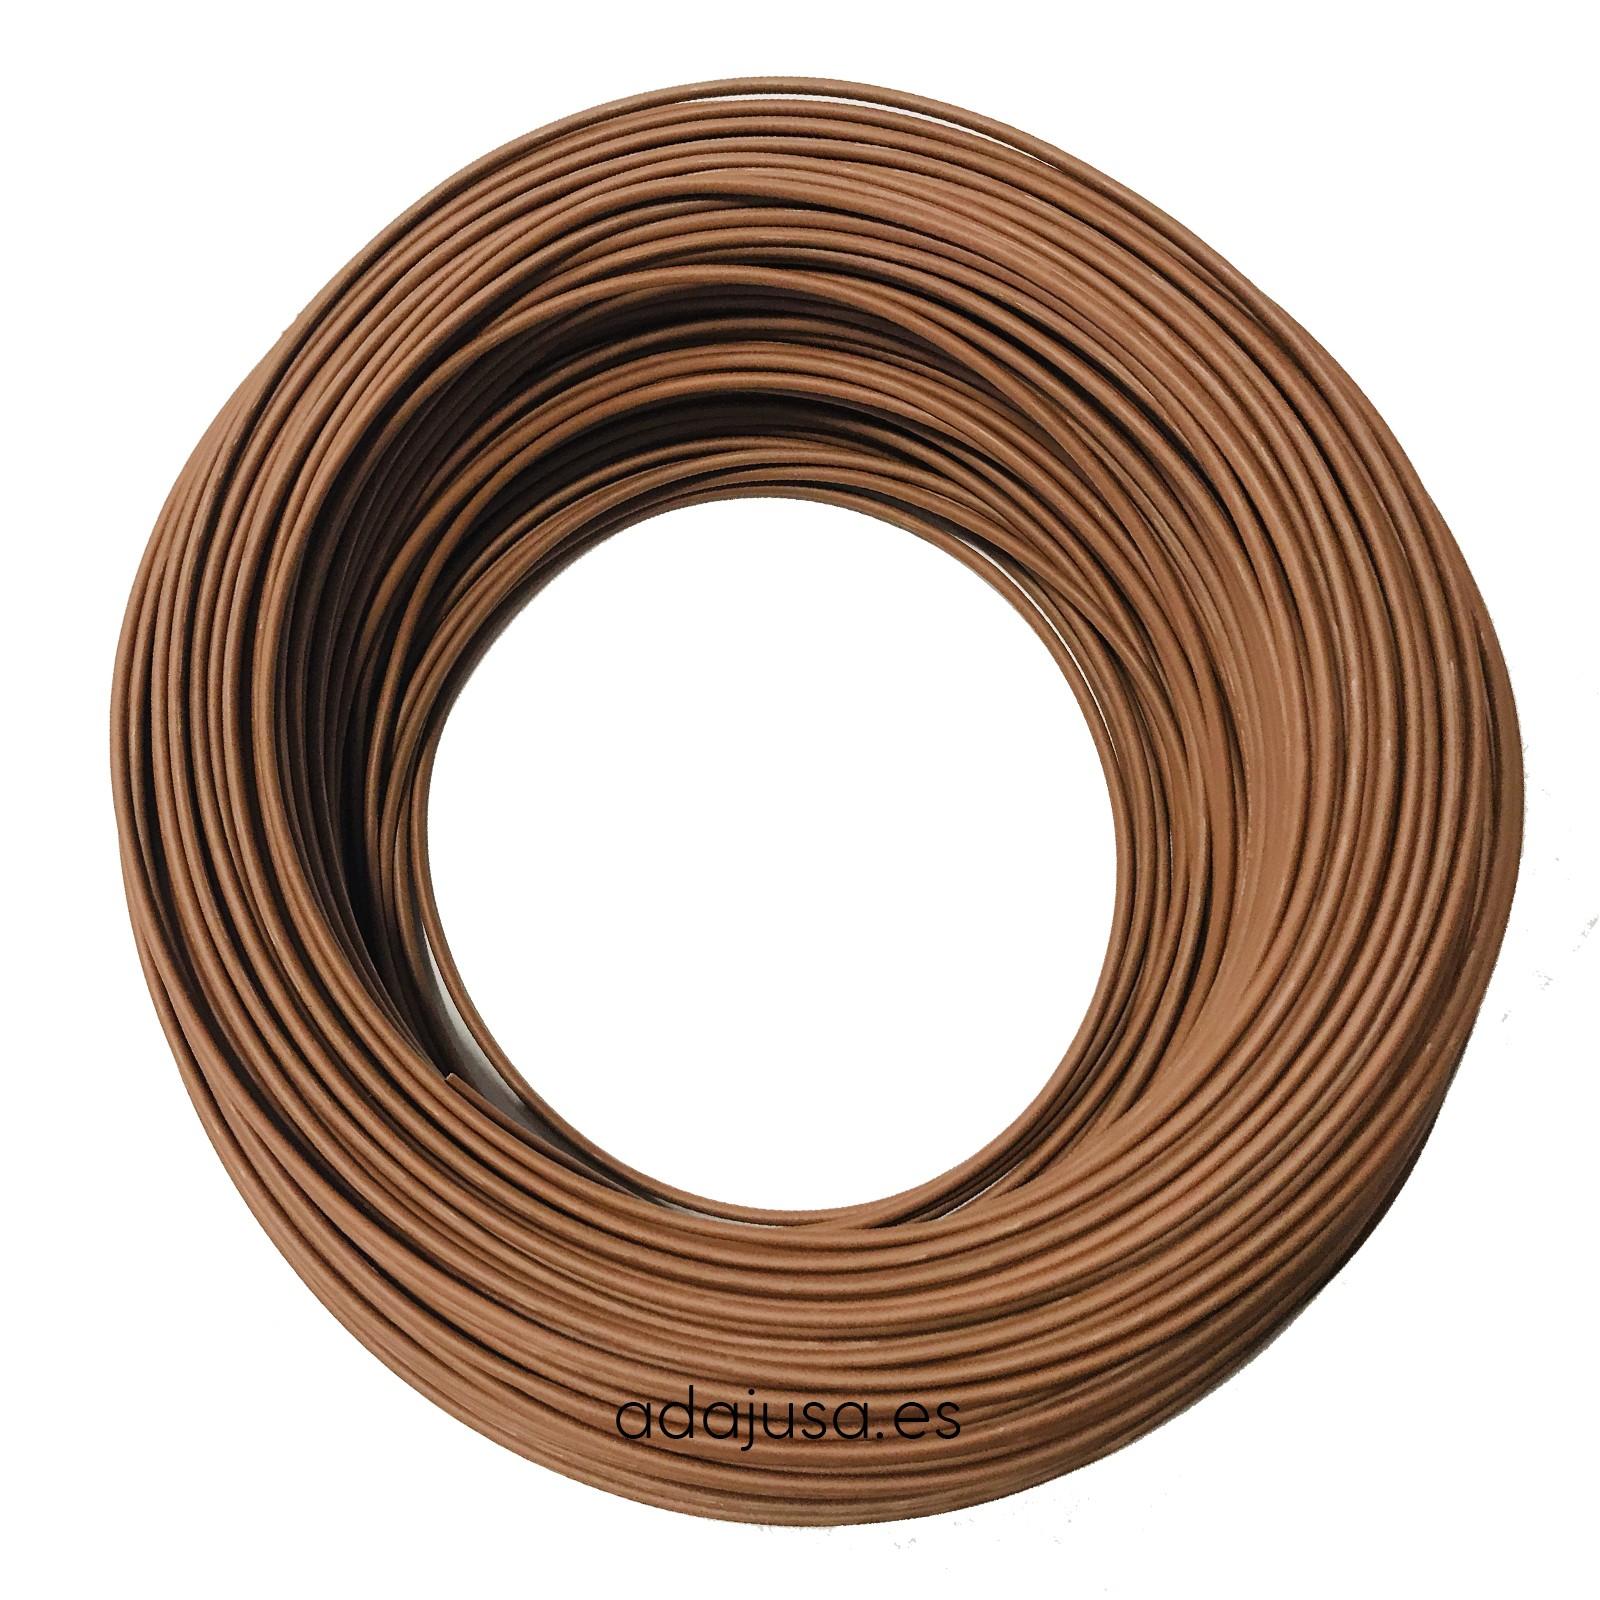 Cable flexible unipolar 4 mm color marrón